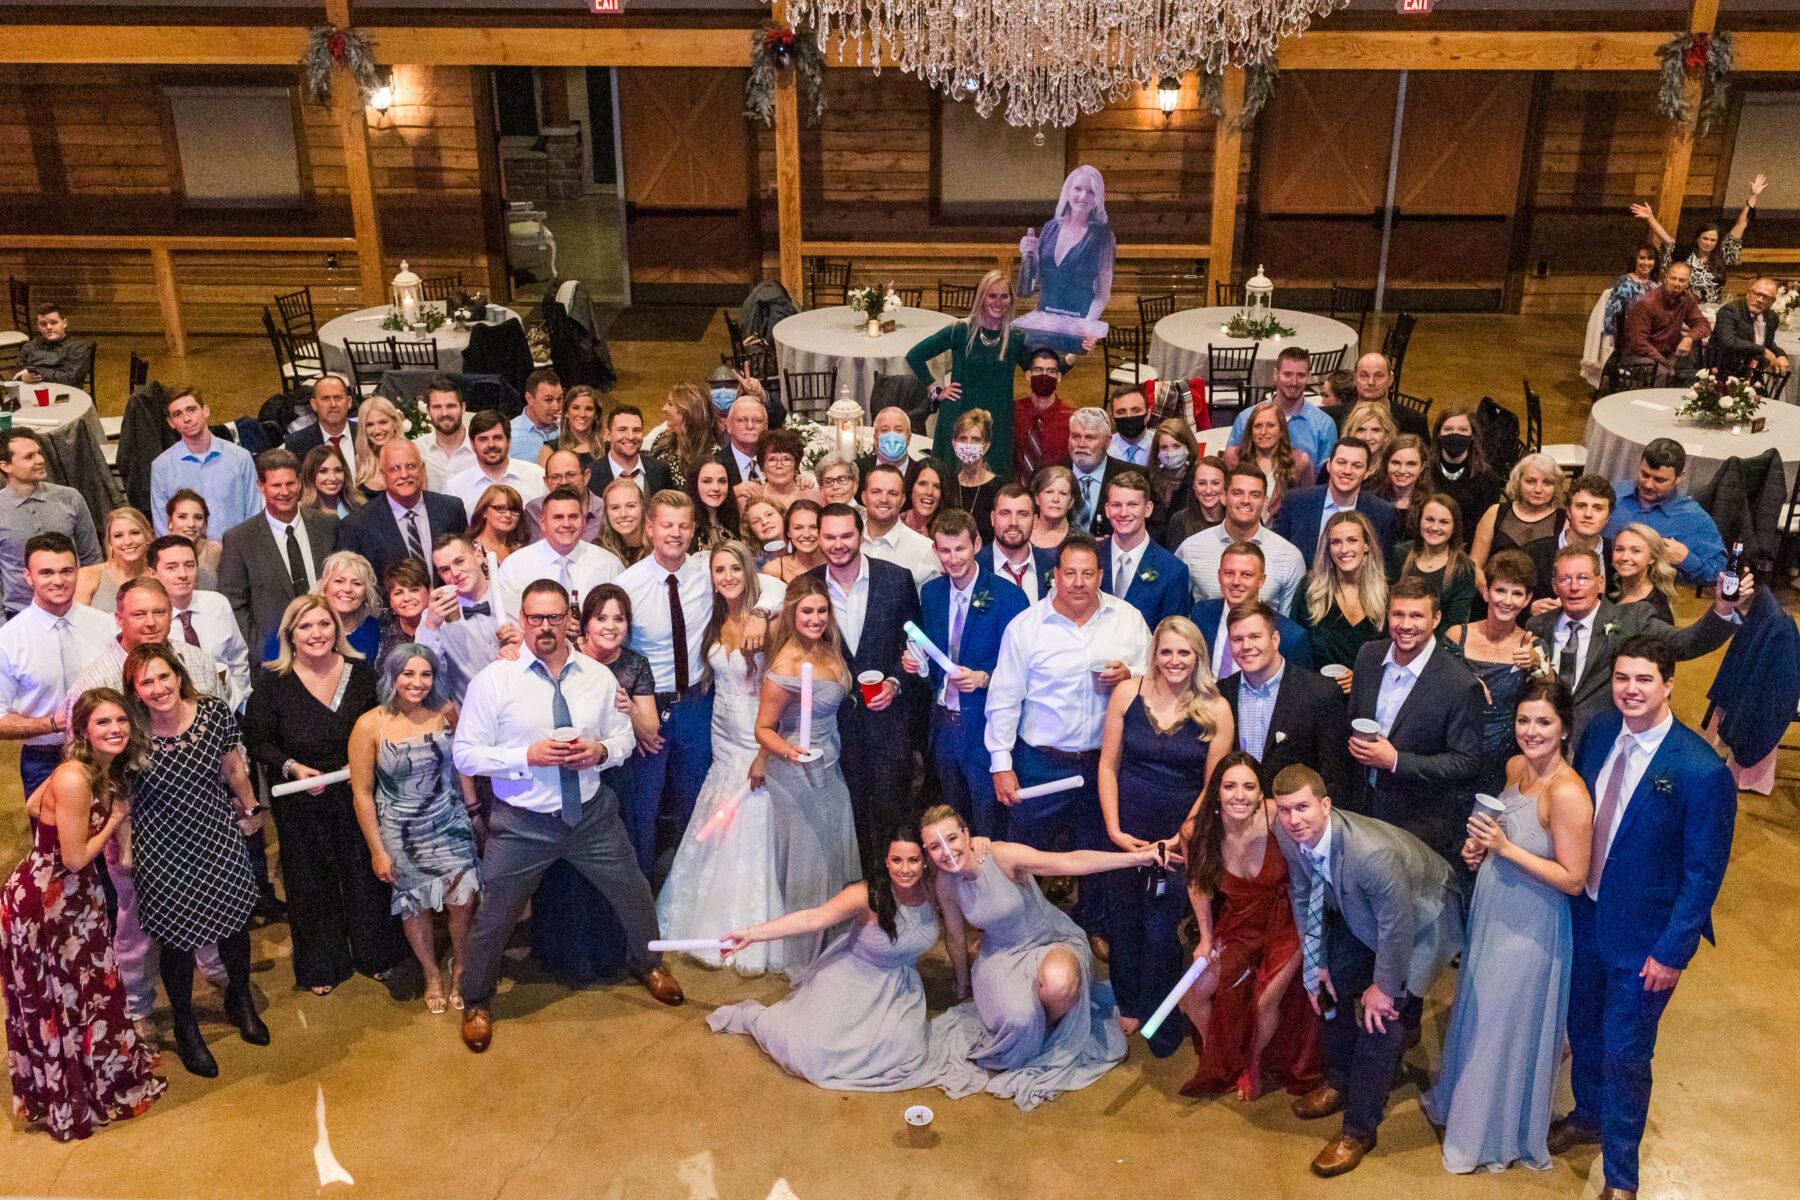 Sycamore Farms Winter Wedding | Nashville Bride Guide